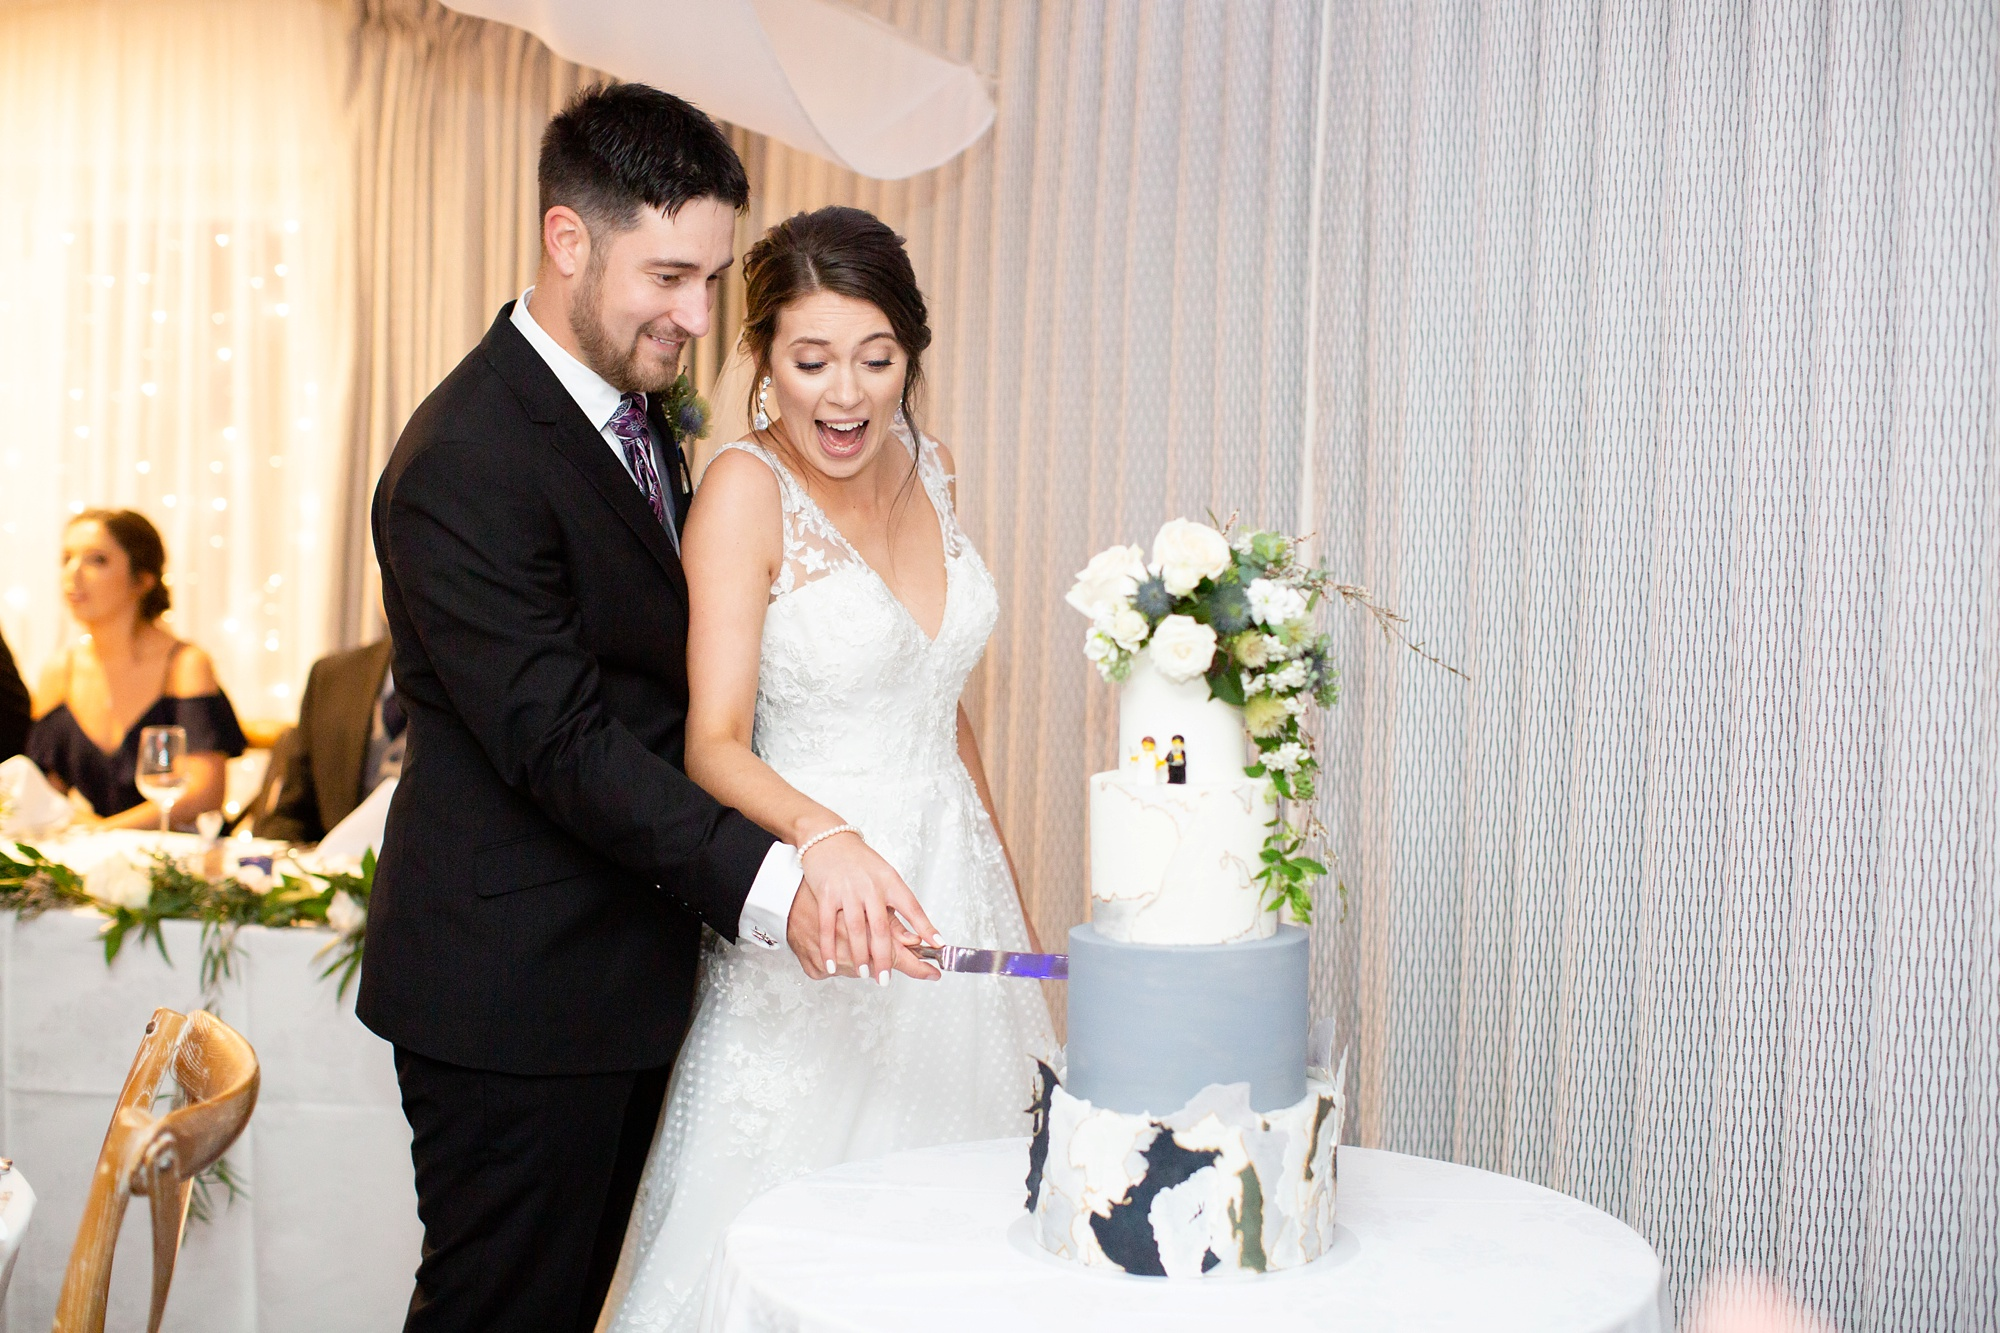 Amy Wolland - Michael & Lisa Married! -660.jpg